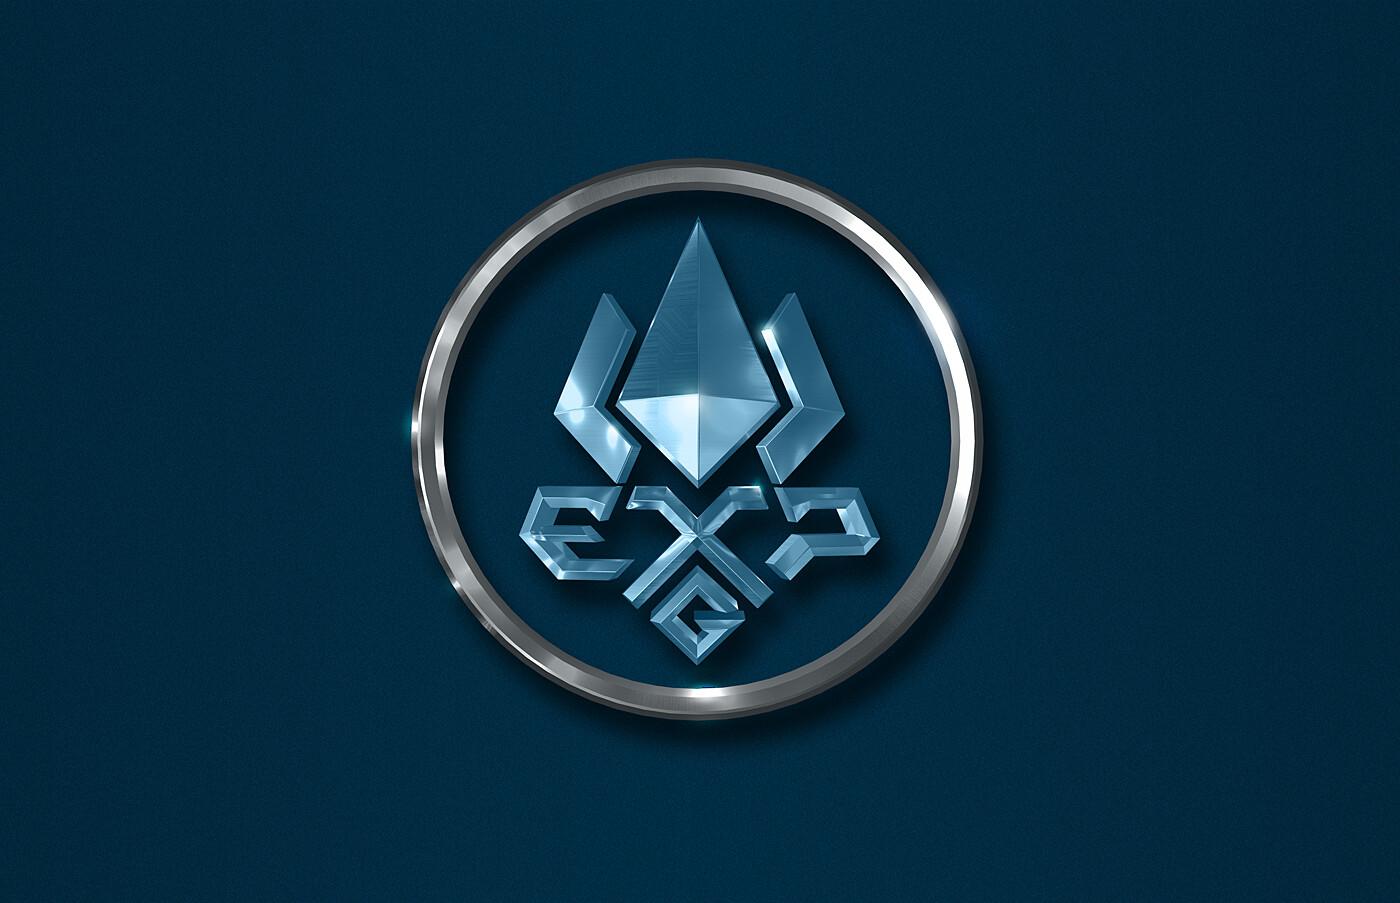 EXP-G - Explorer Germany logo design